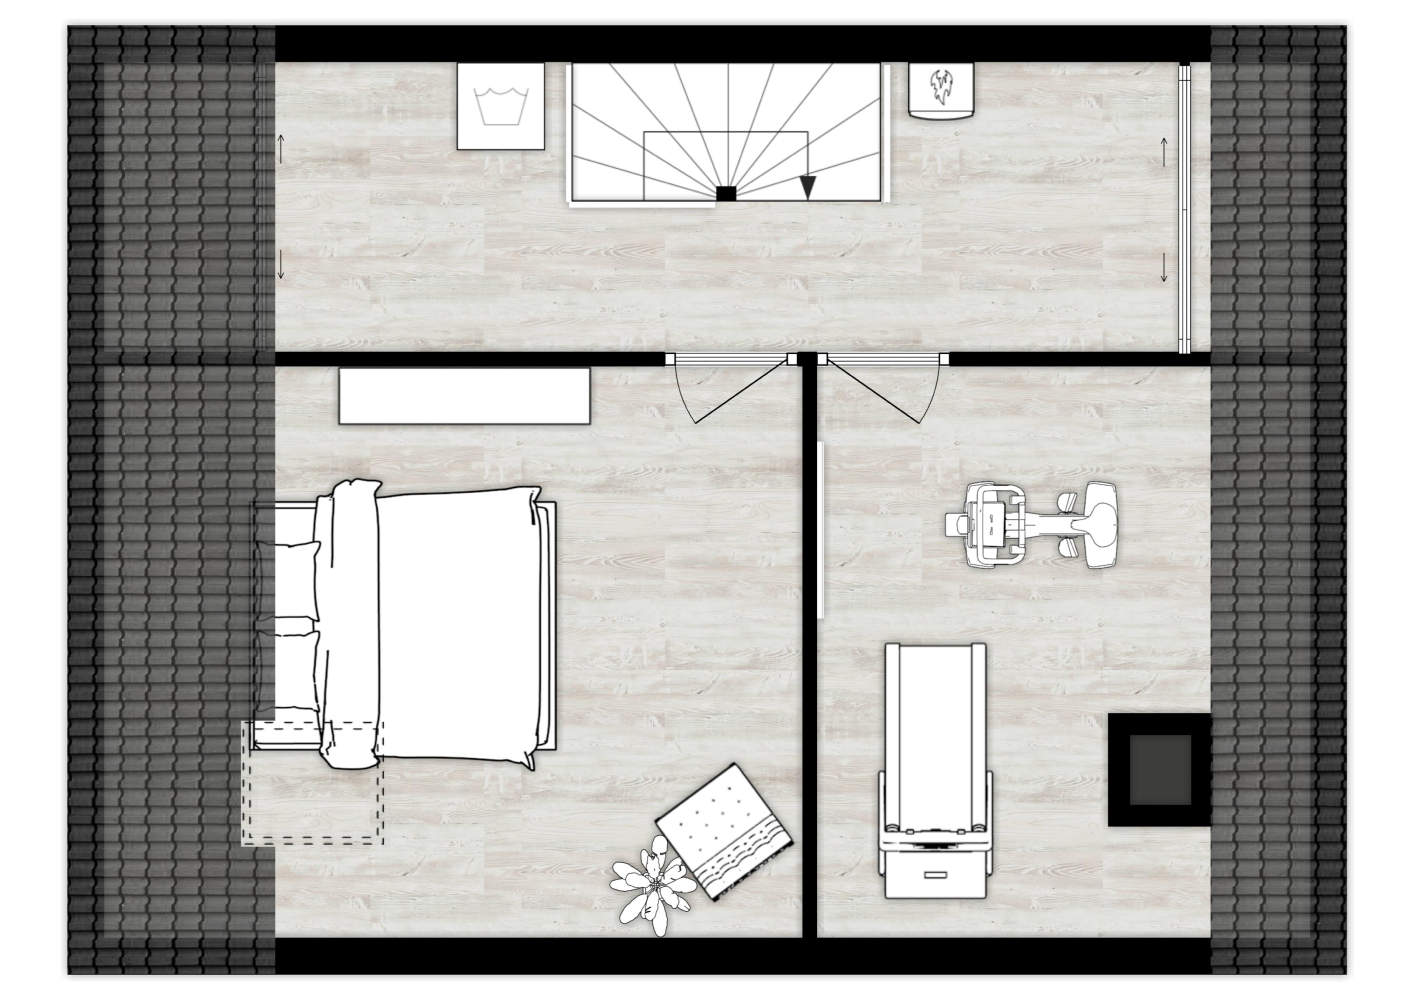 Black White 2d Floor Plan Made With Floorplanner Com Floor Plans Create Floor Plan How To Plan